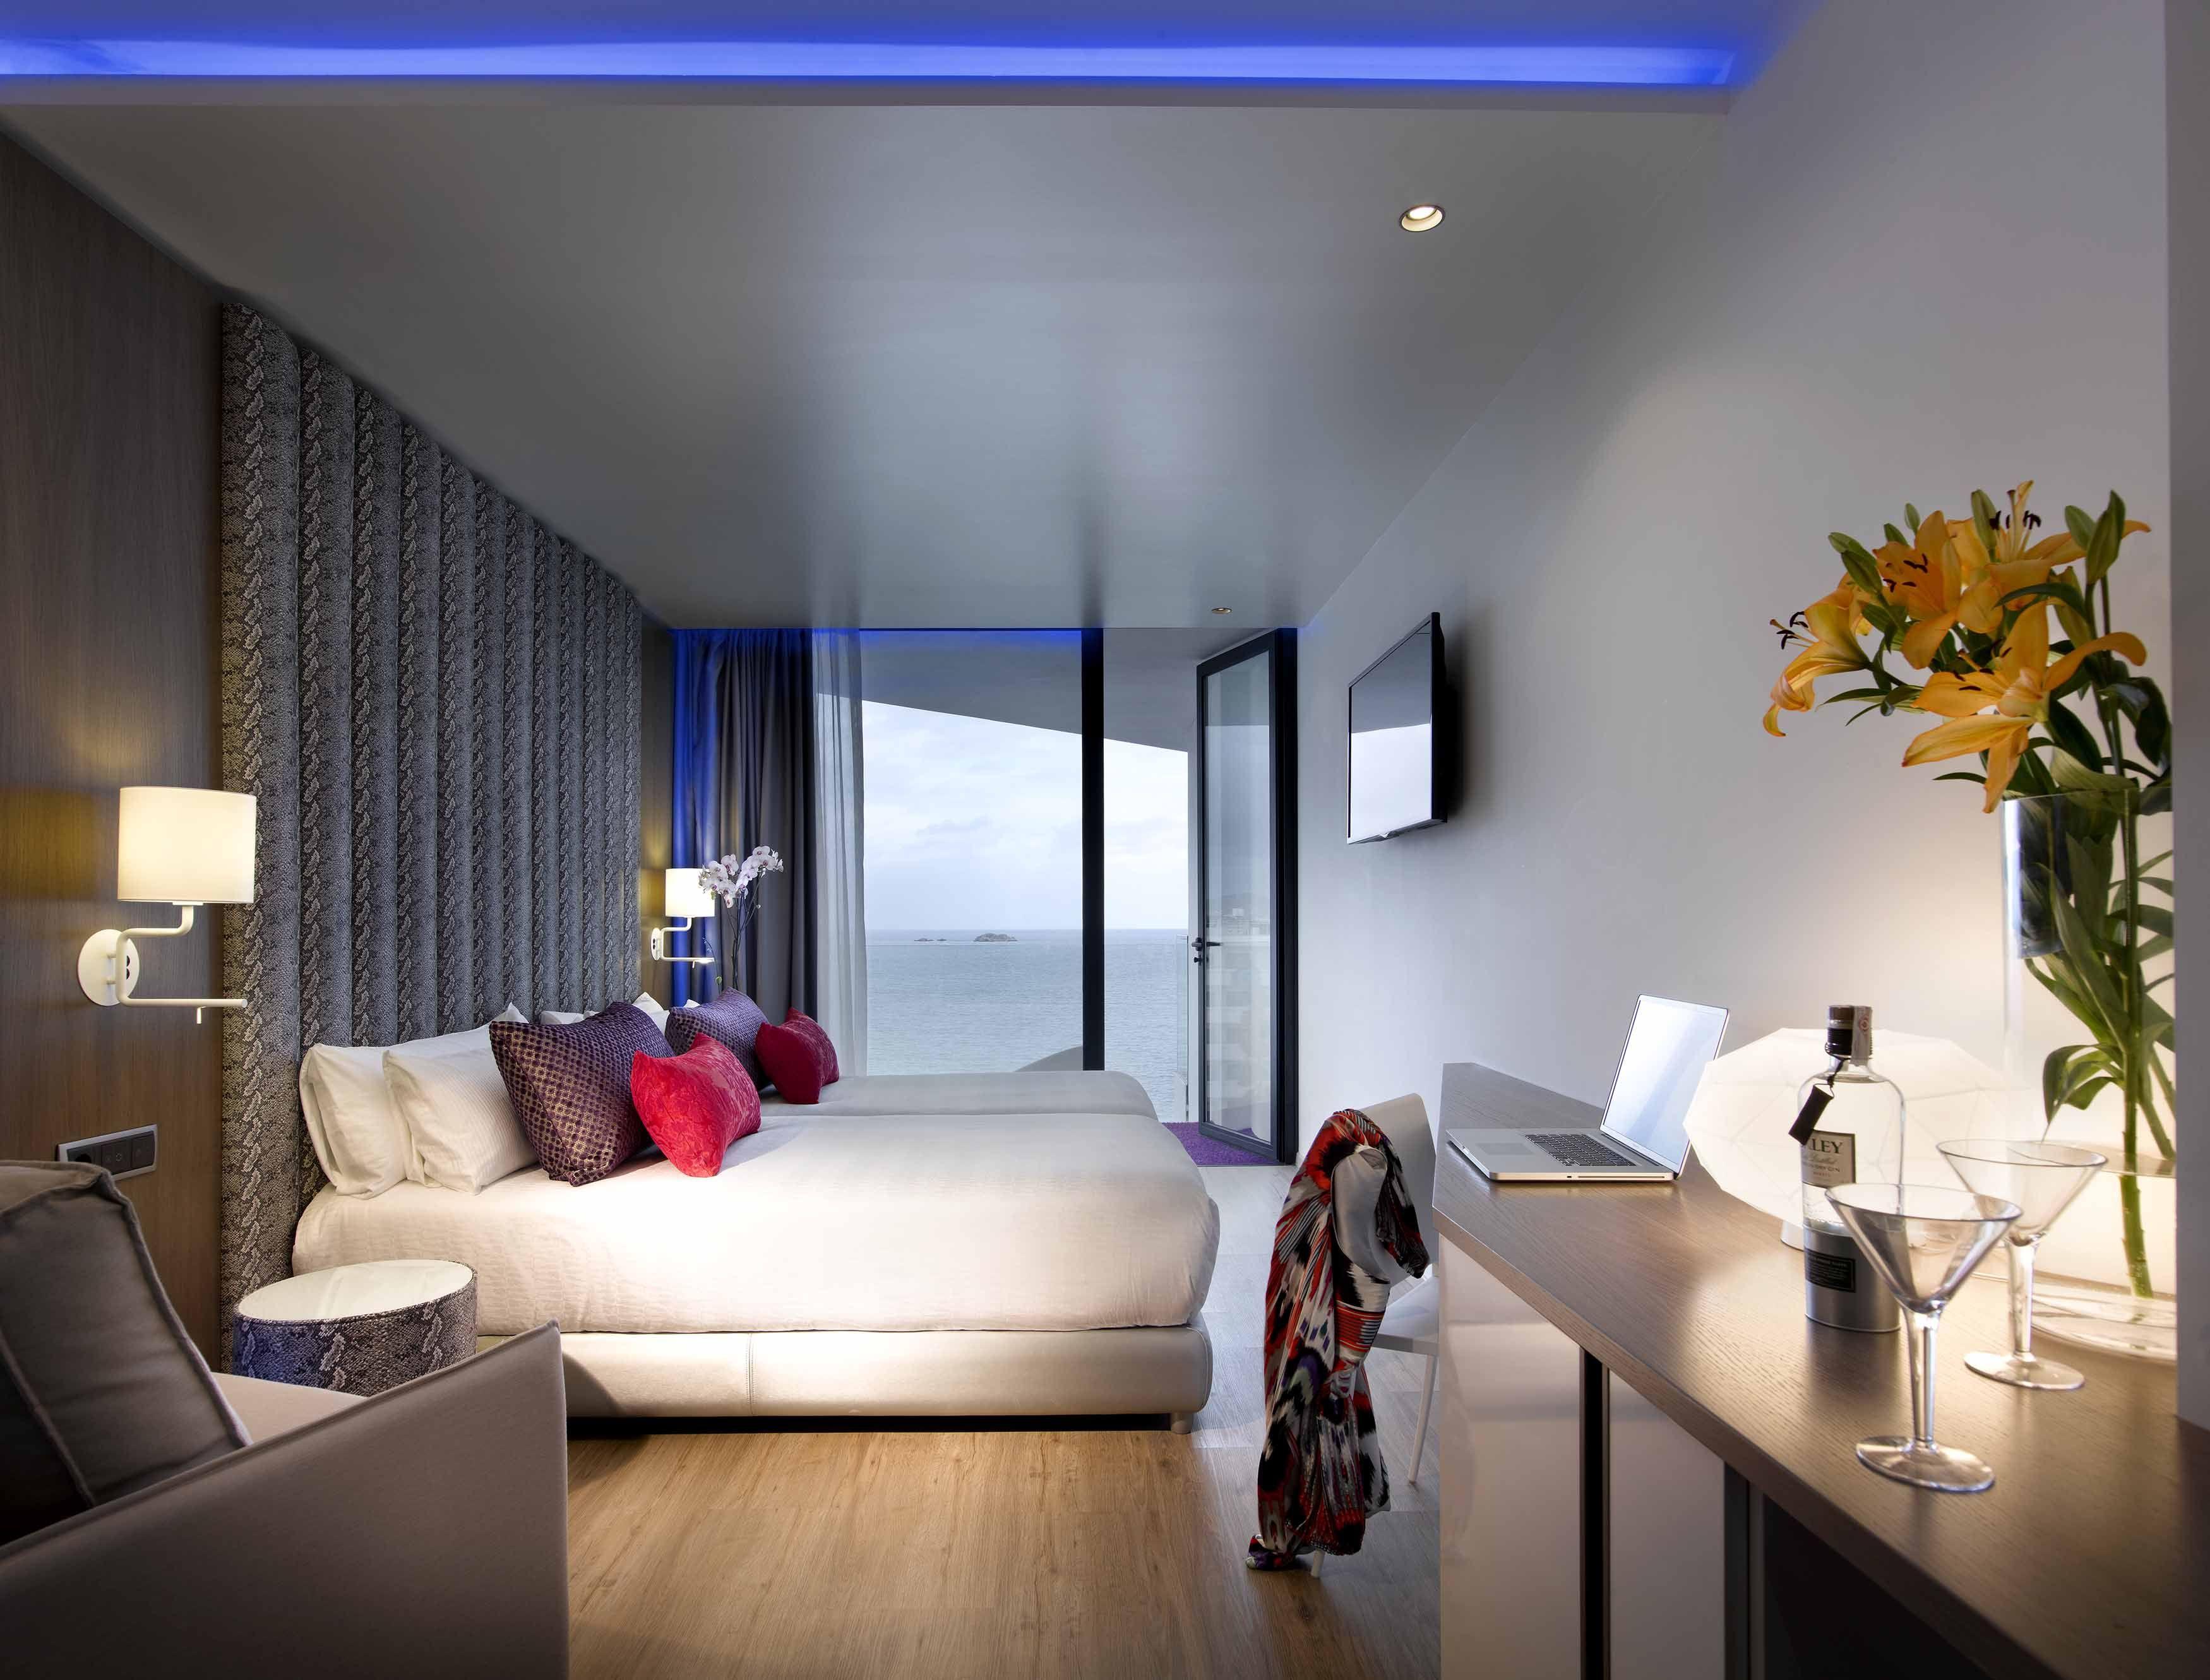 equarius hotel deluxe suites. Hard Rock Hotel \u0026 Casino By Beltá Frajumar Projects, Ibiza Spain Hotels And Restaurants Equarius Deluxe Suites